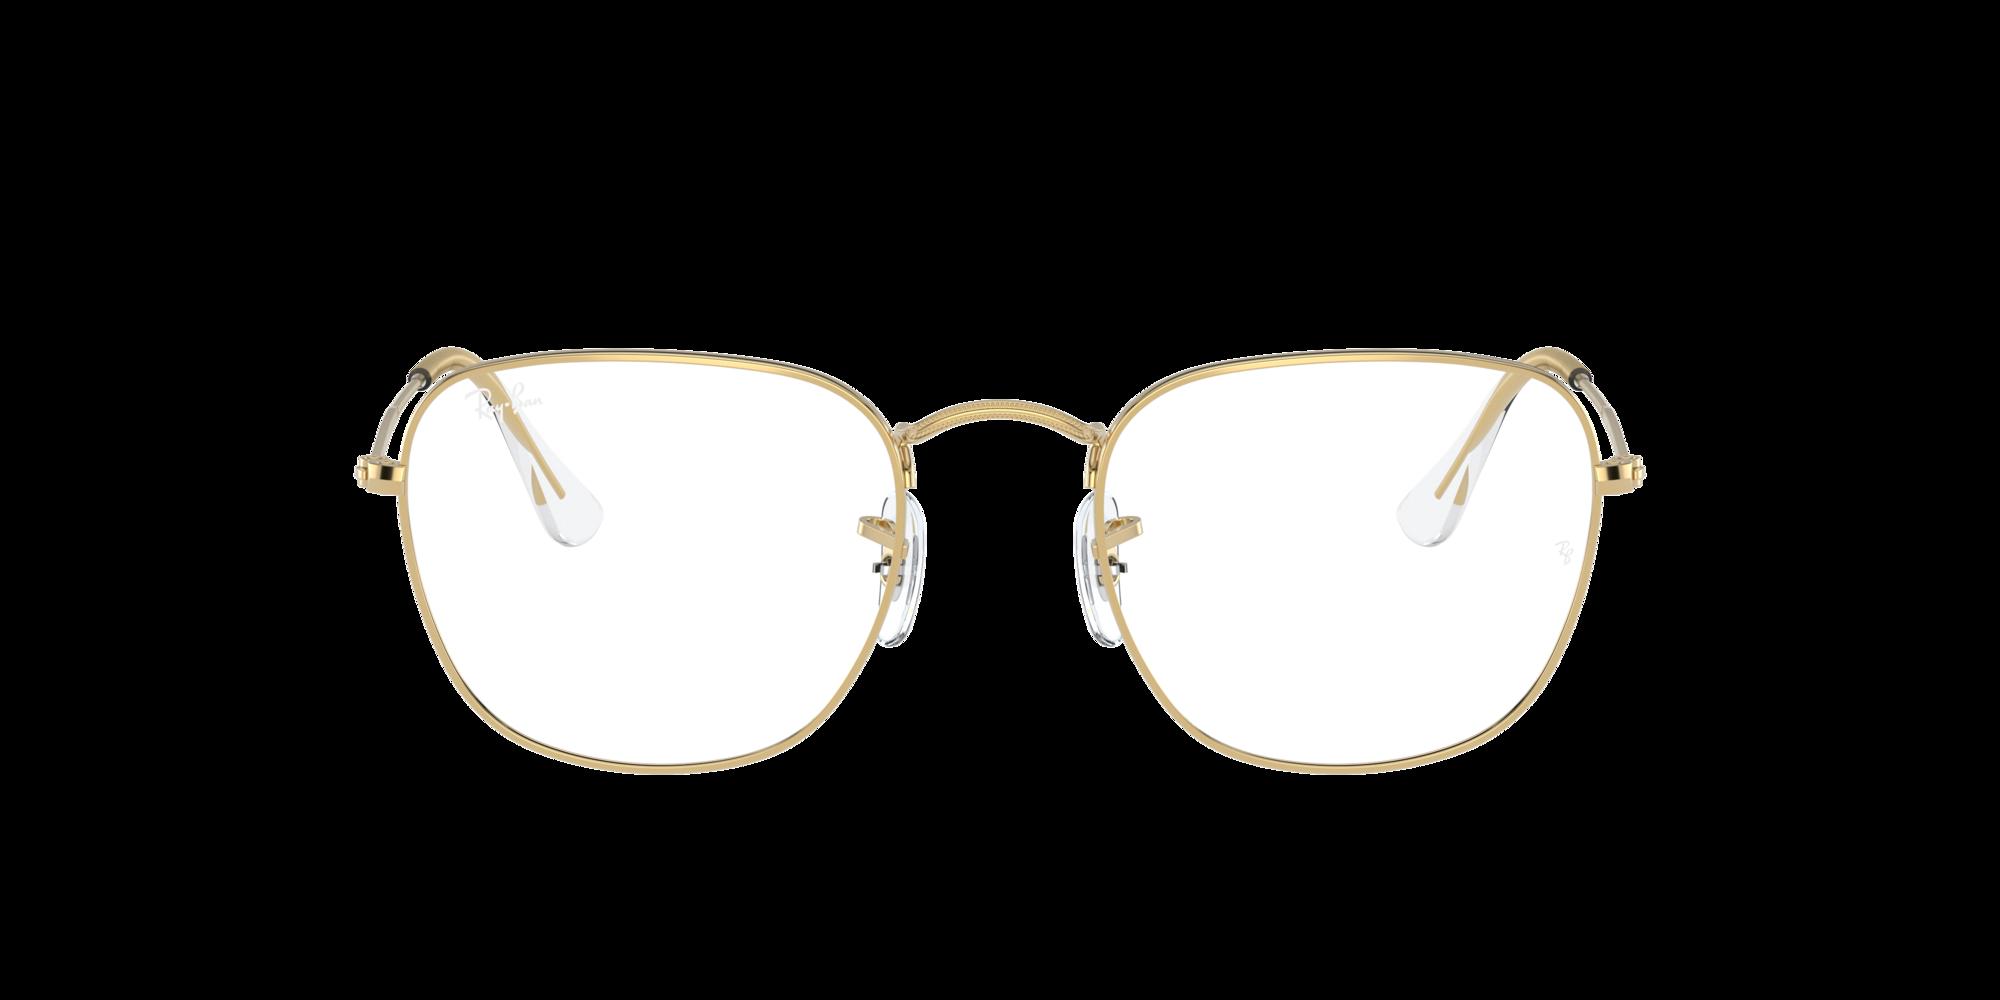 Image de RX3857V FRANK from LensCrafters | Lunettes, lunettes d'ordonnance en ligne, lunetterie